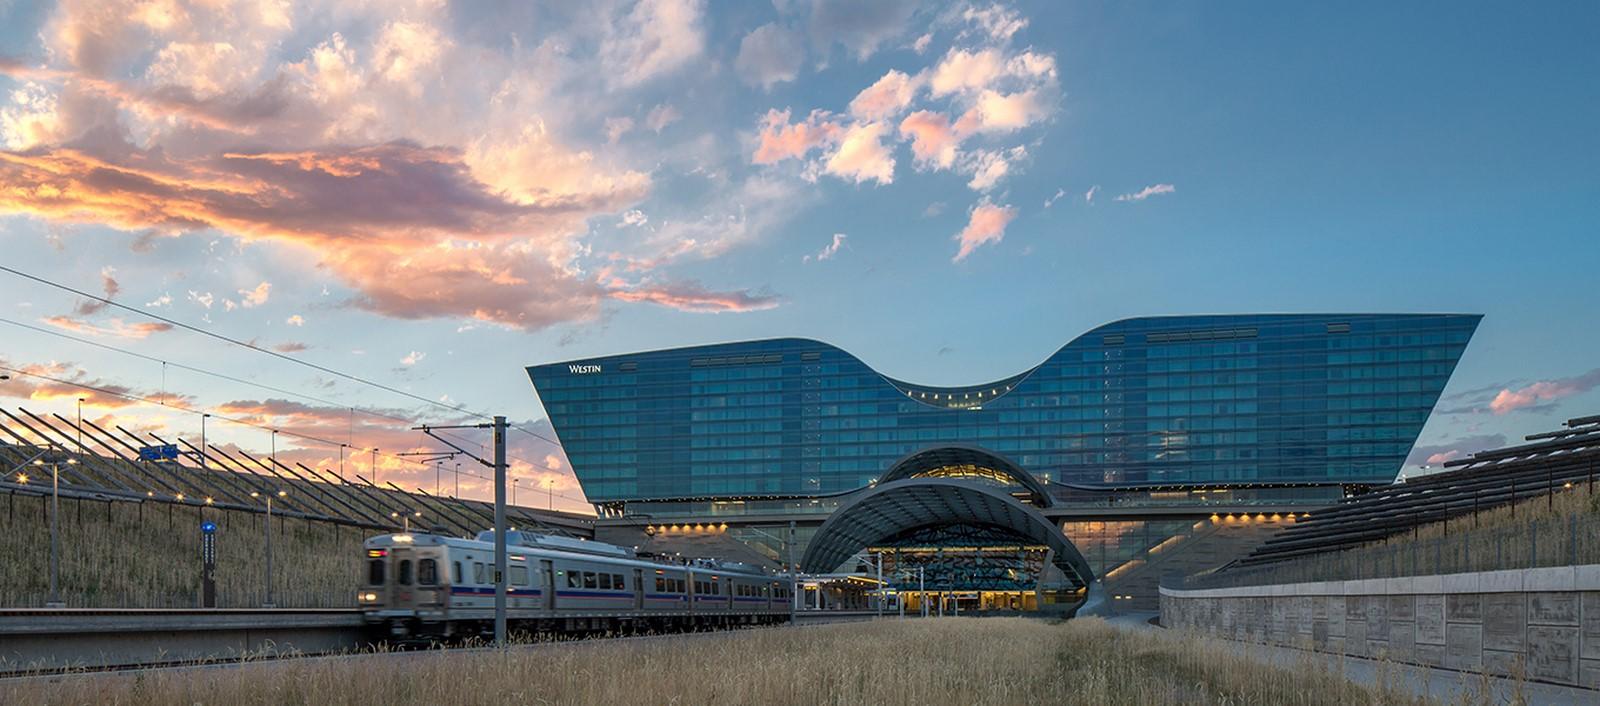 Architects in Kansas city - Top 90 Architects in Kansas city - Sheet34